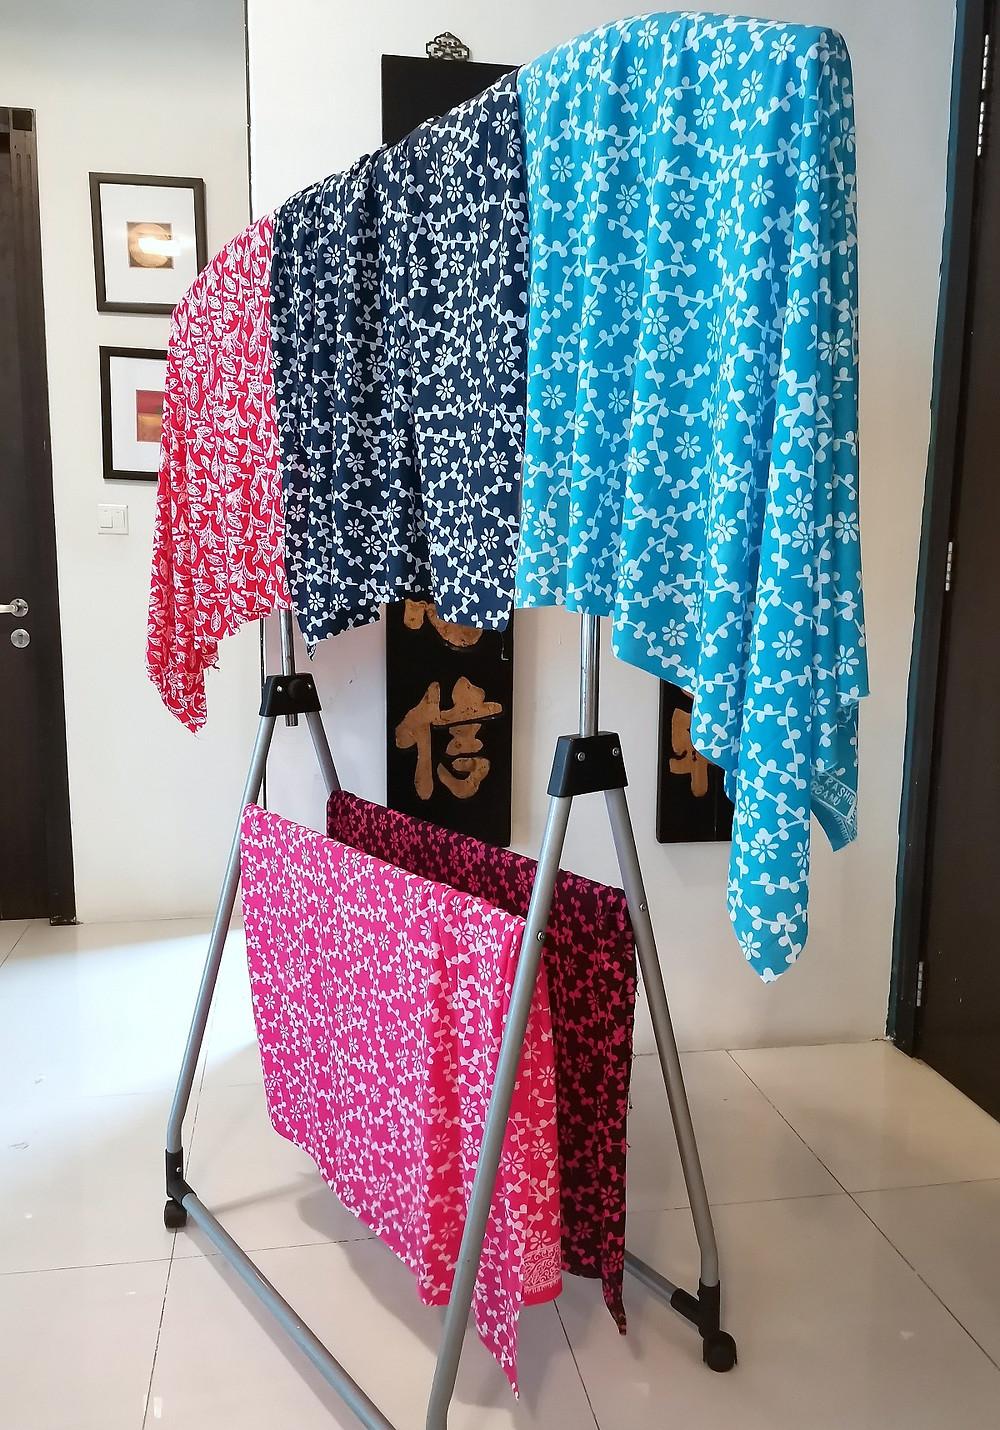 Colourful Terengganu batik fabrics hung to dry starched